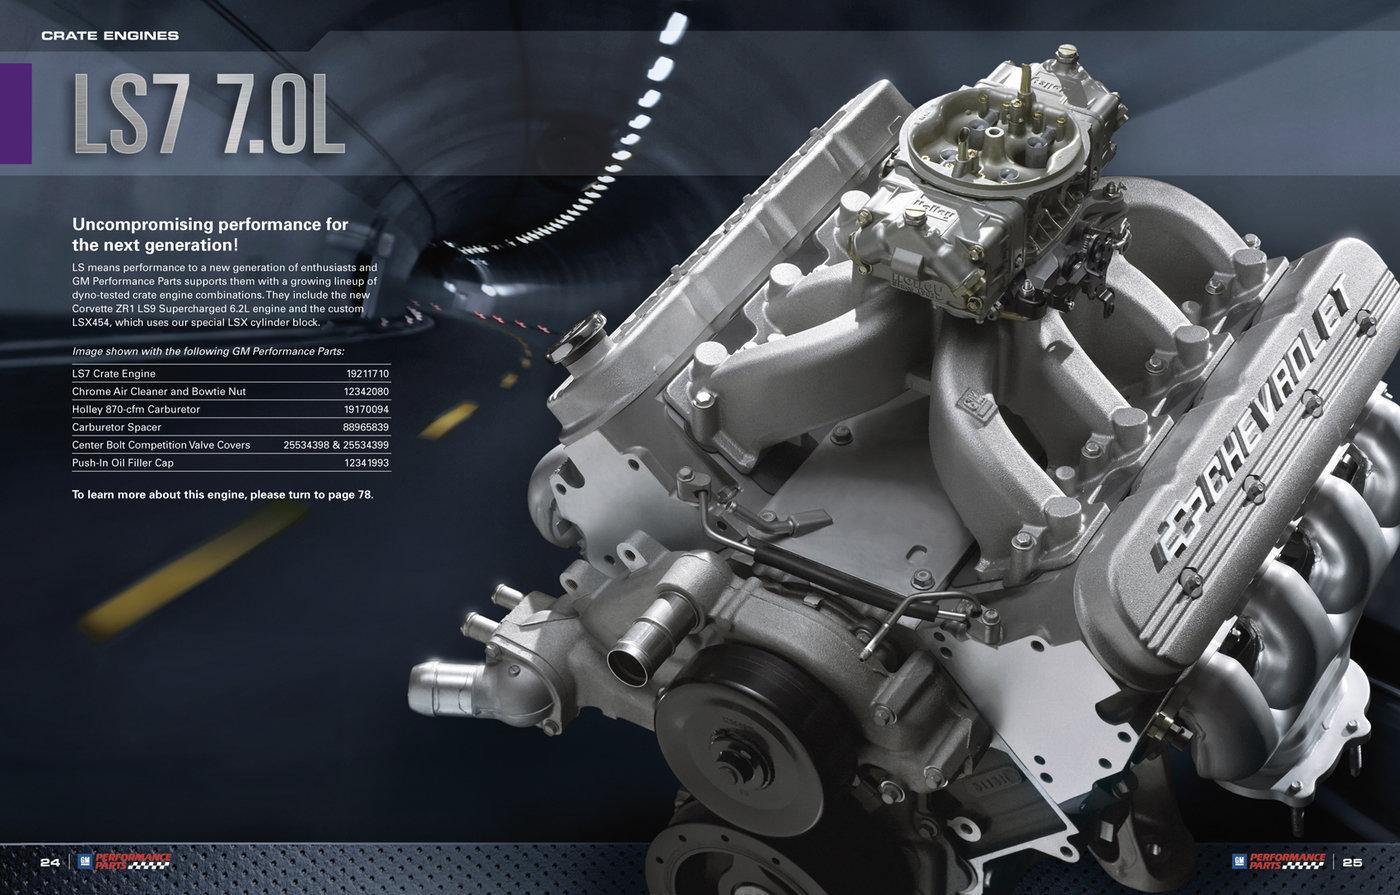 GM Performance Parts Catalog by Richard Rae at Coroflot com